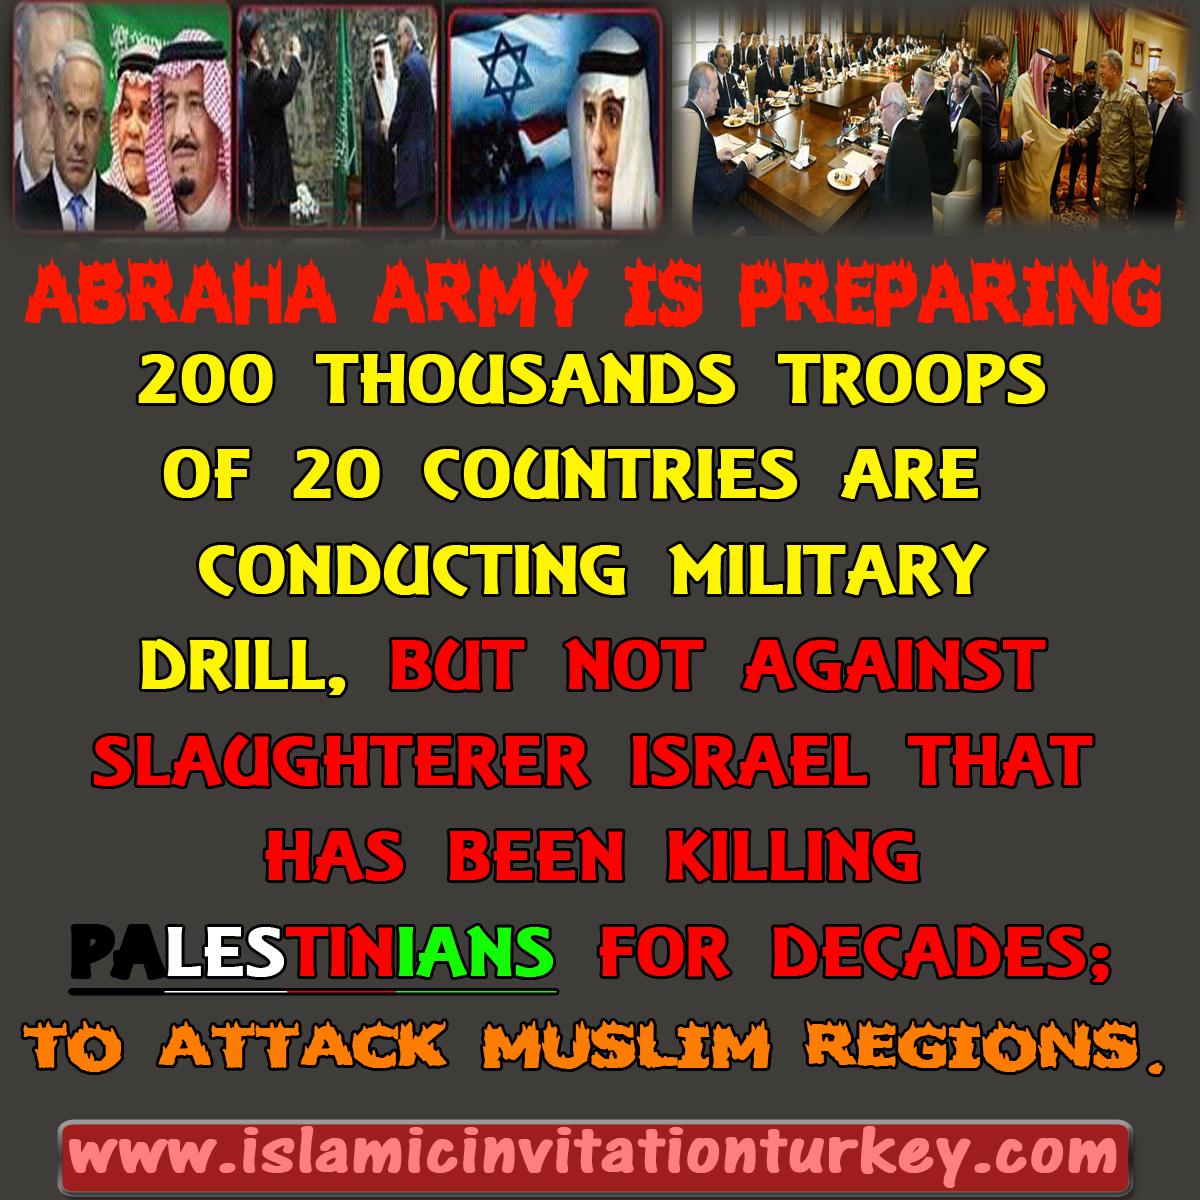 abraha army